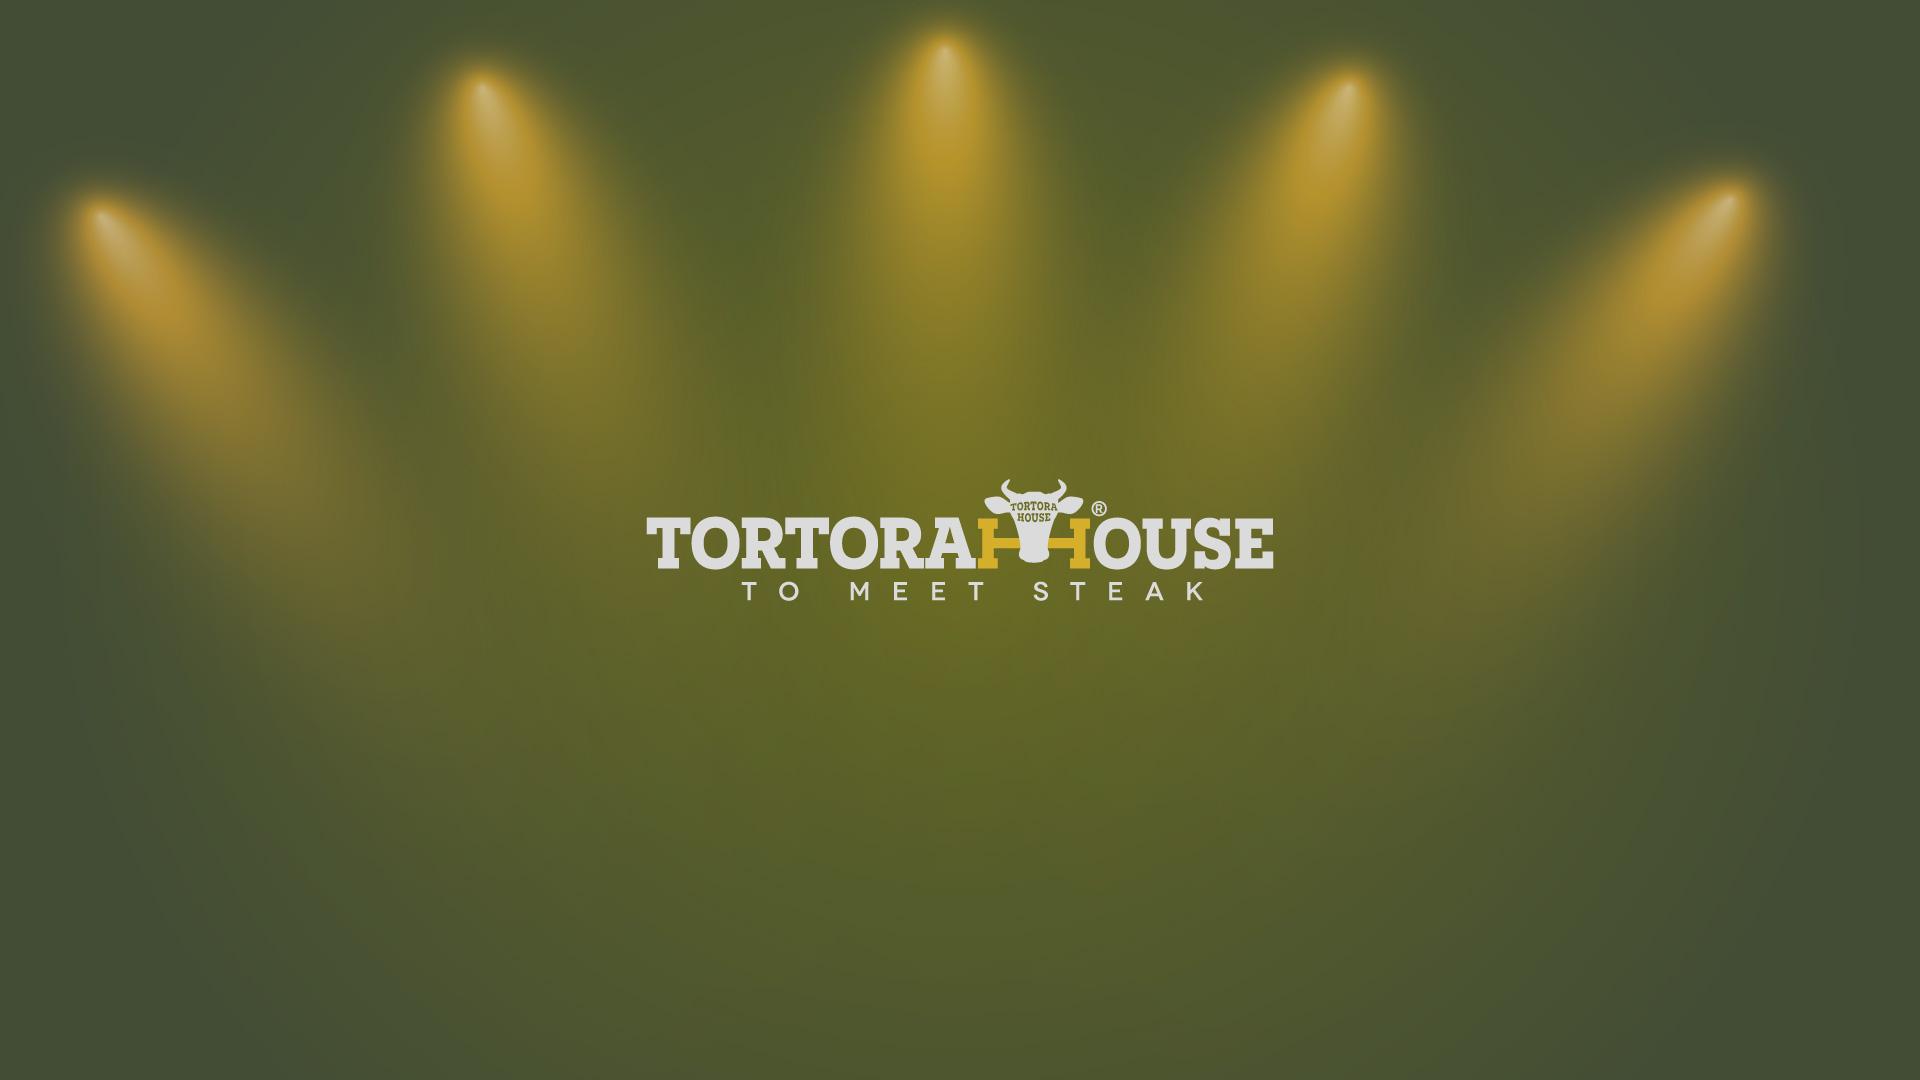 tortorahouse-main2